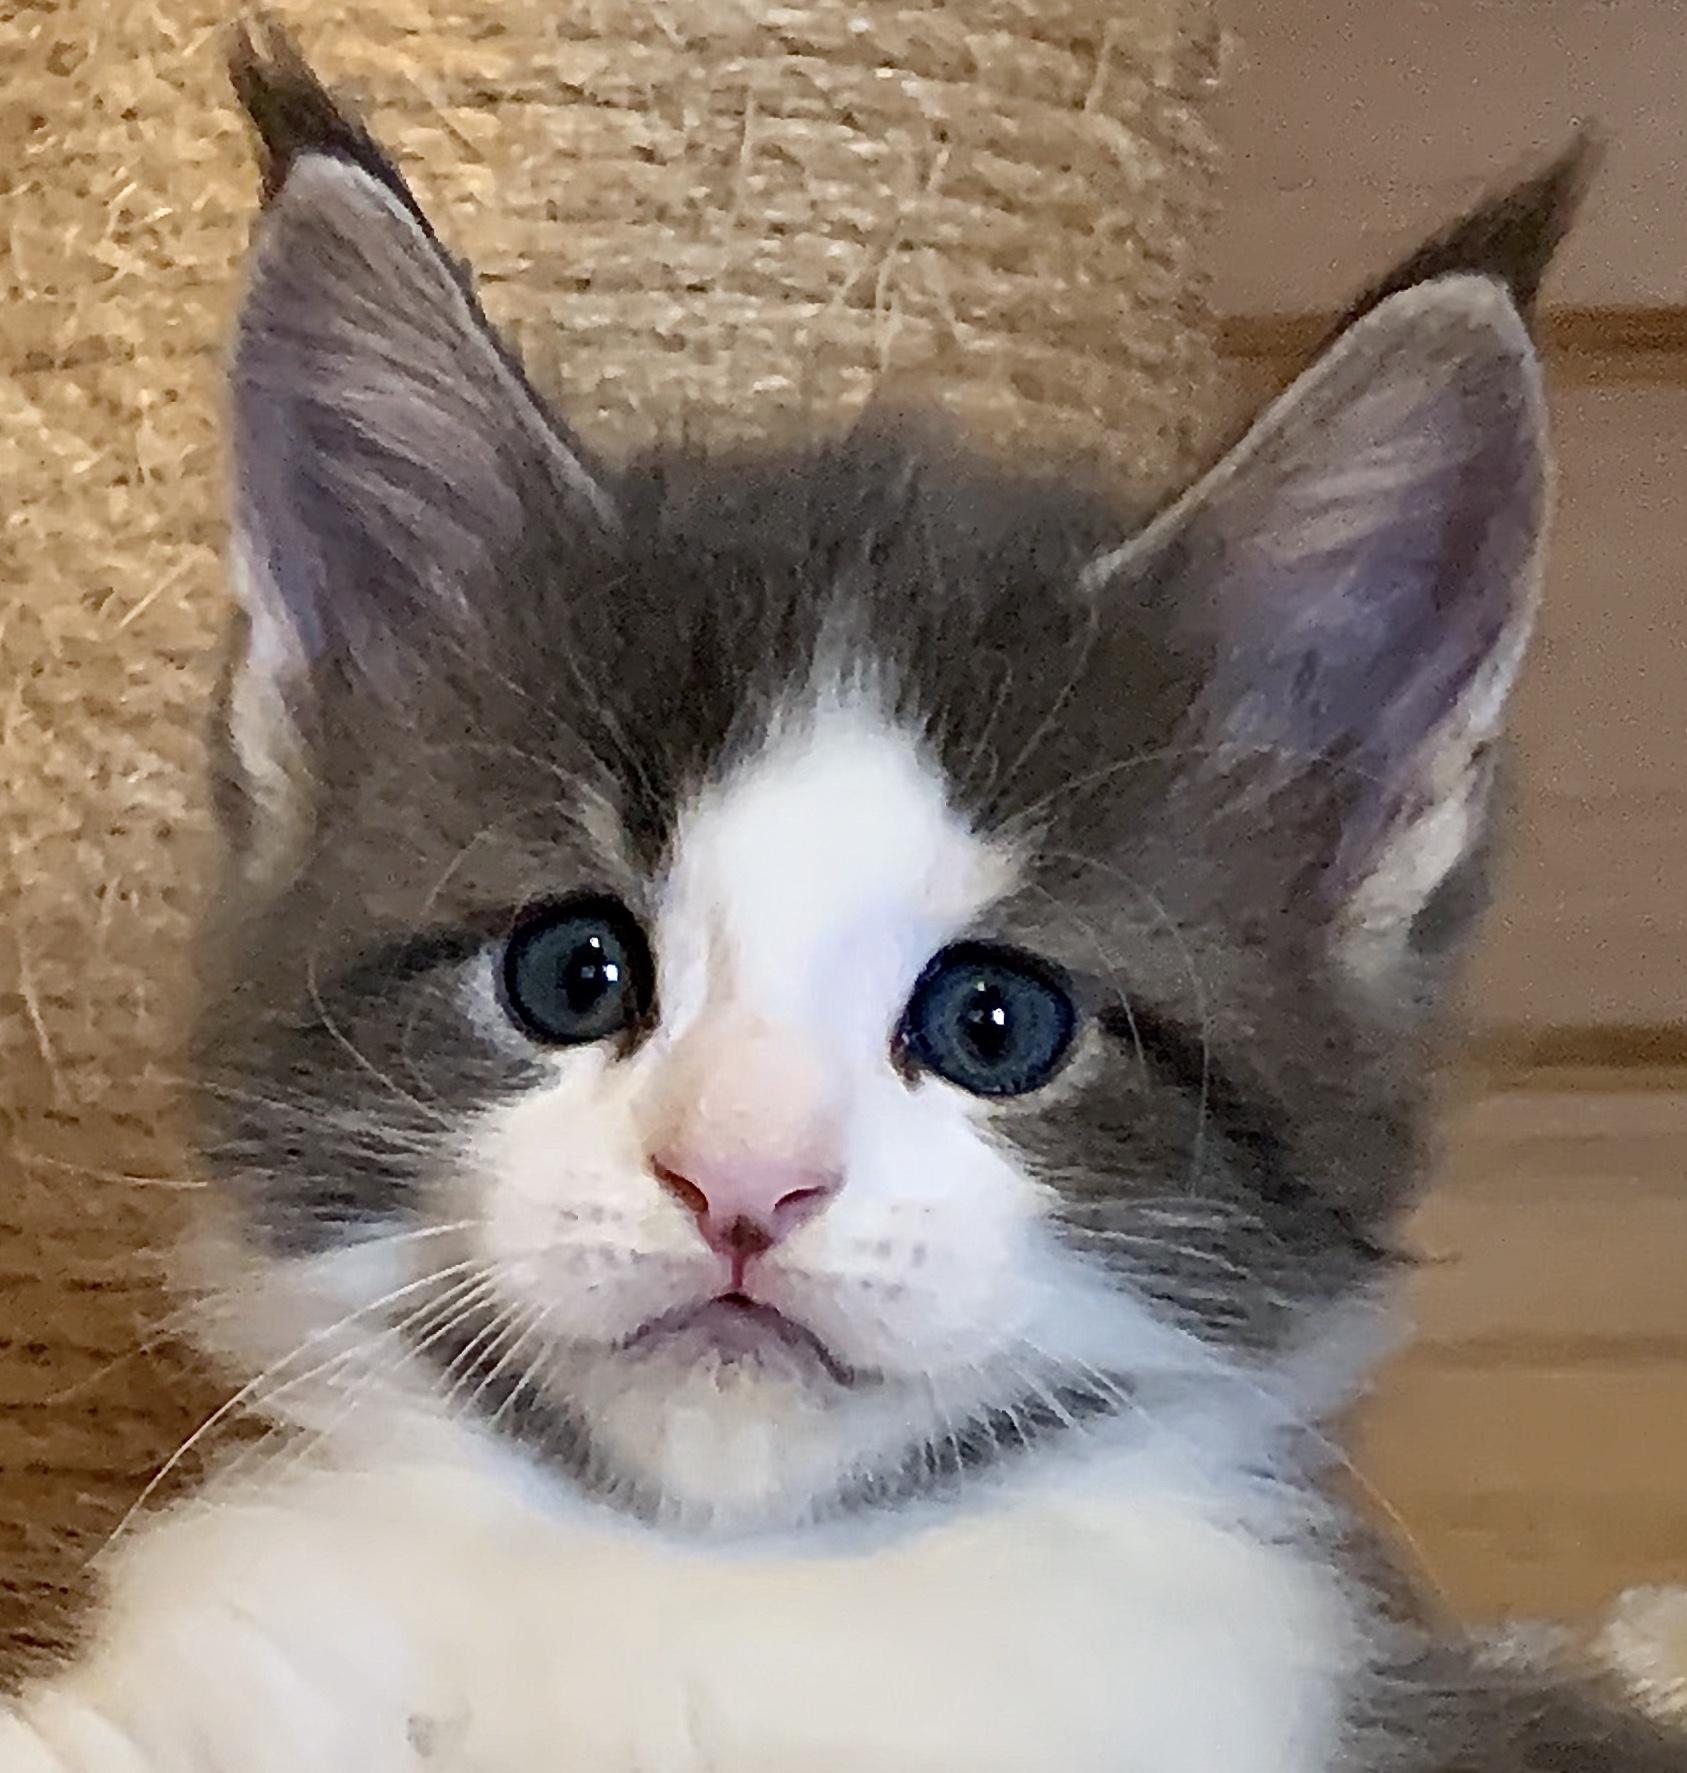 fotka kočky VRH L: LEON GRAND VON ERILLIAN*CZ